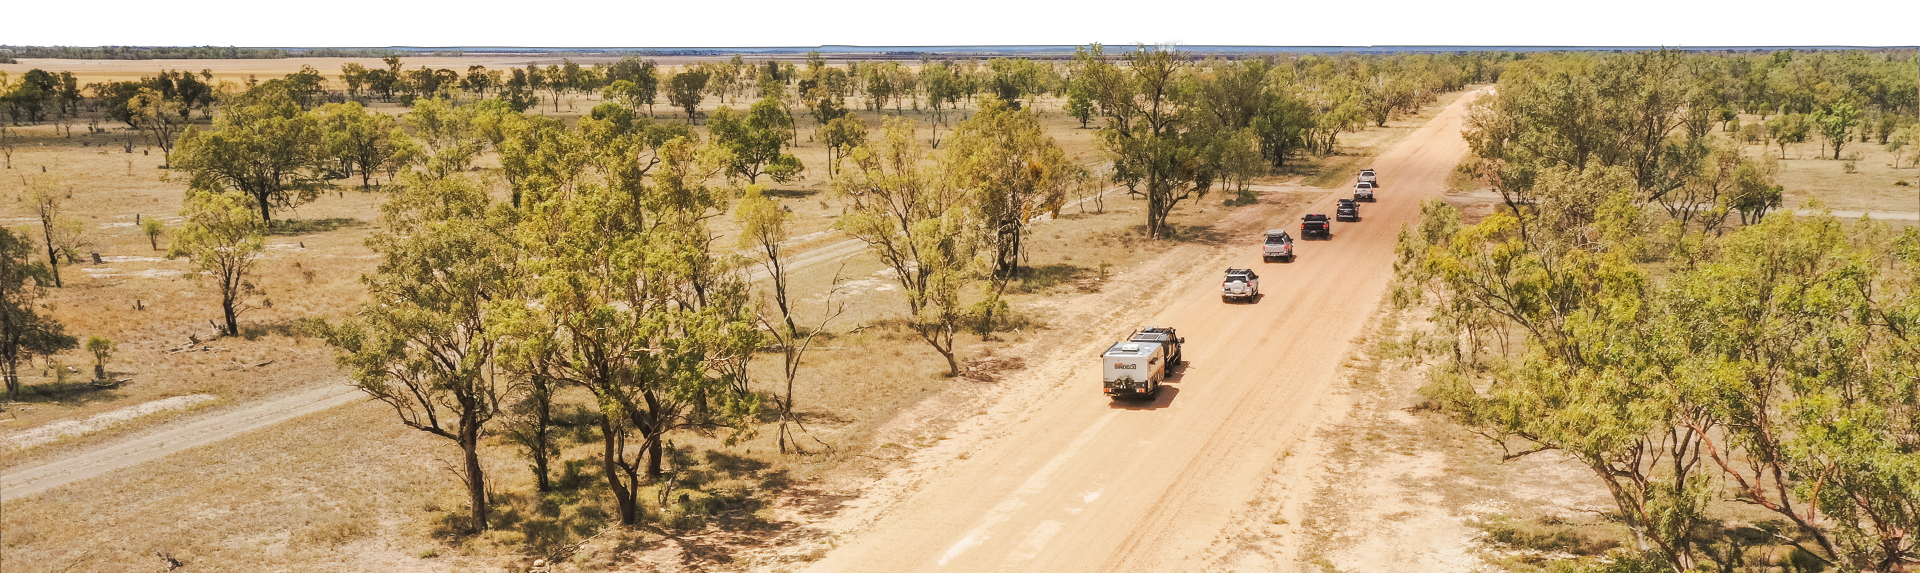 tjm-sale-outbackhero-03